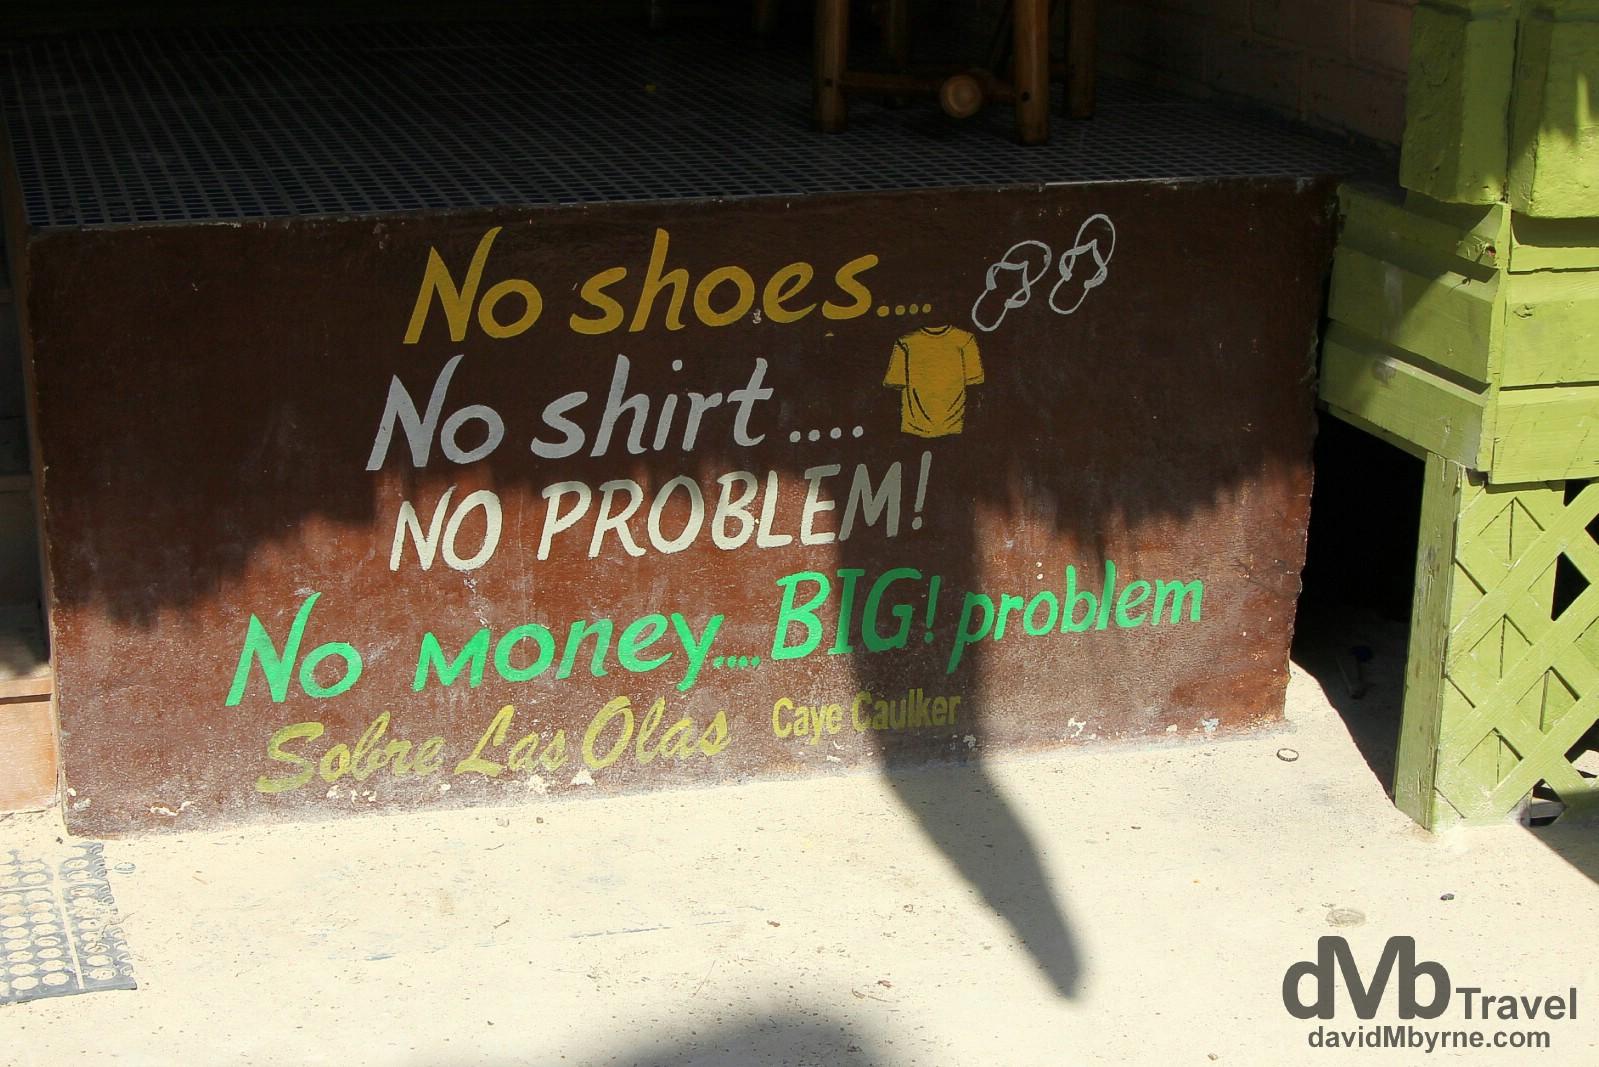 No Shoes, No Shirt, No Problem. Caye Caulker, Belize. May 13th 2013.